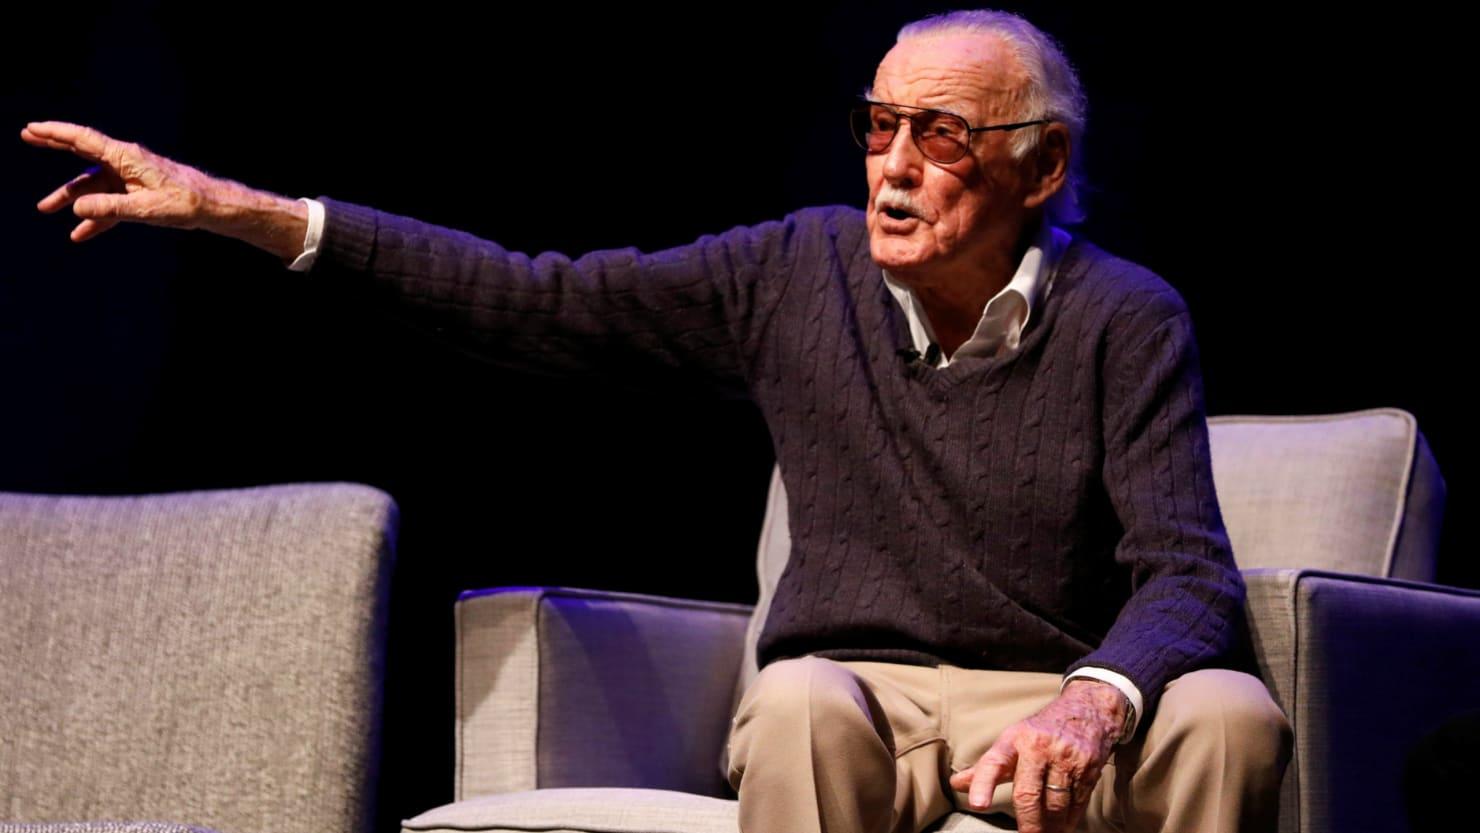 thedailybeast.com - Marvel Mogul Stan Lee Dies at 95: Report